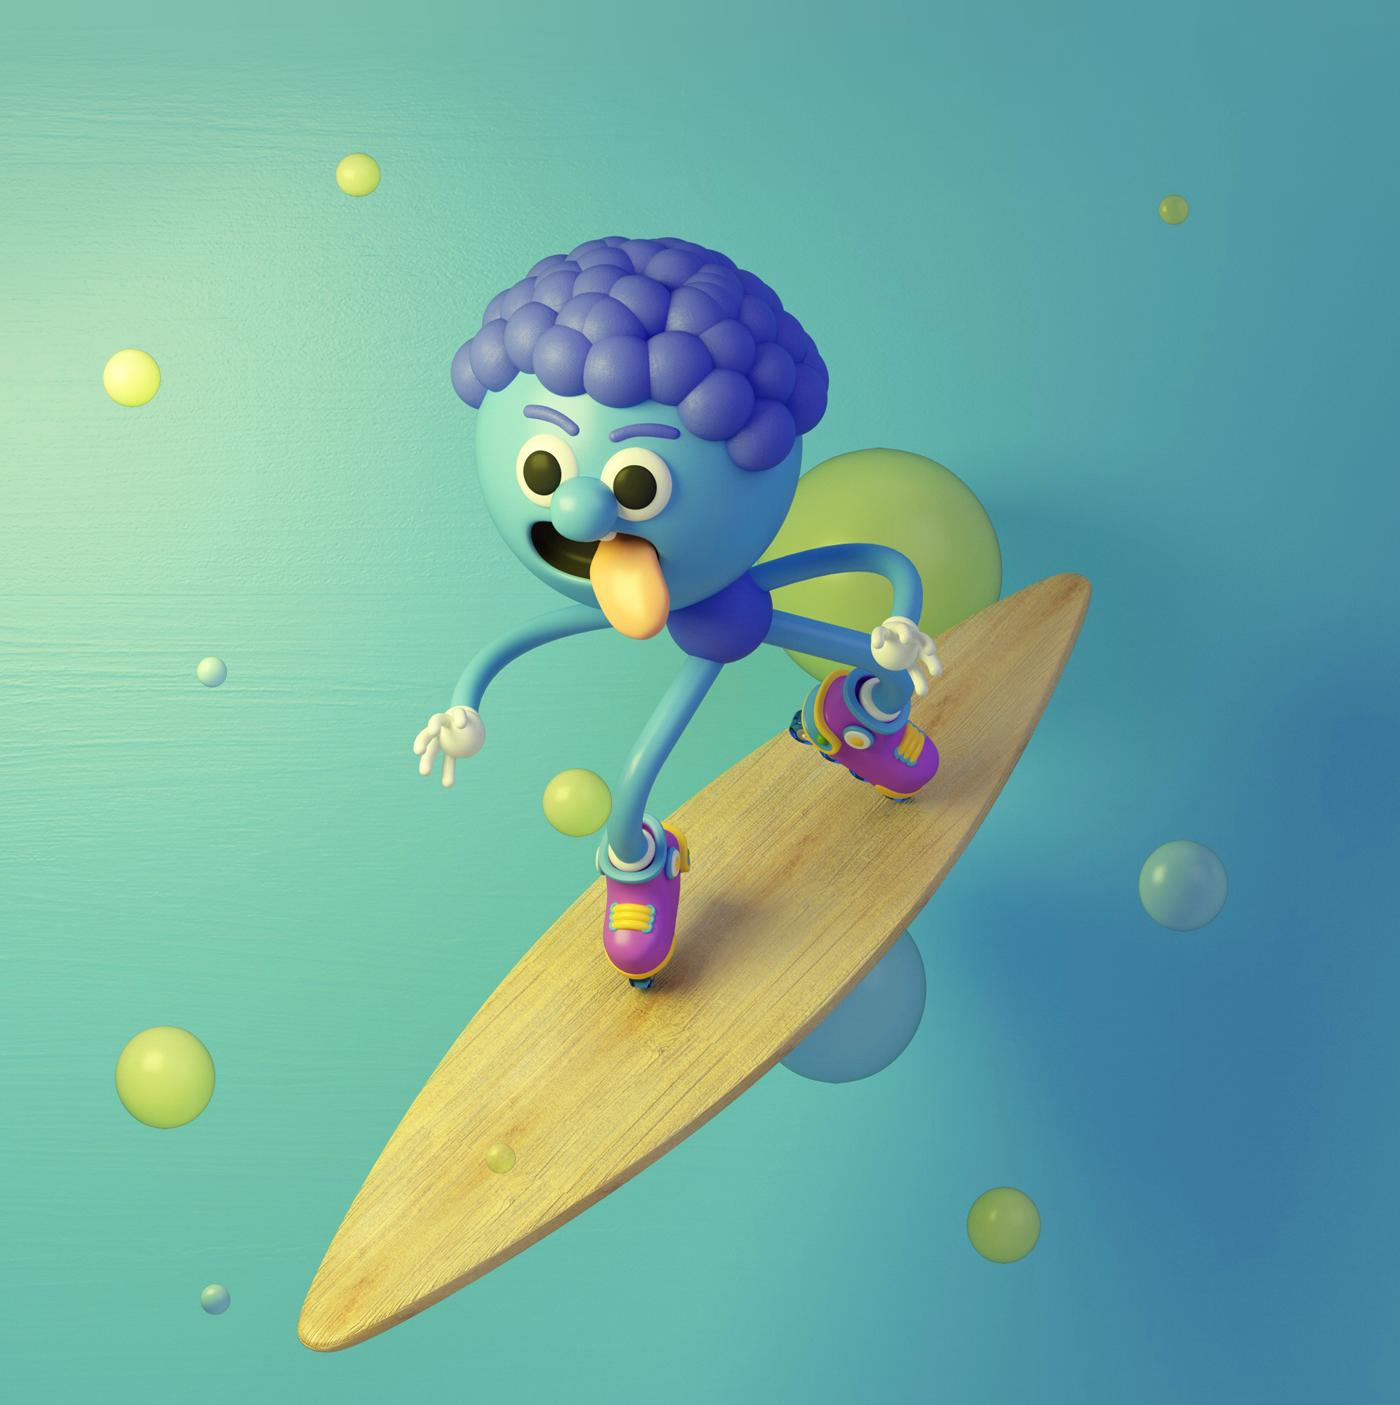 Character Design,Illustration,Toy Design